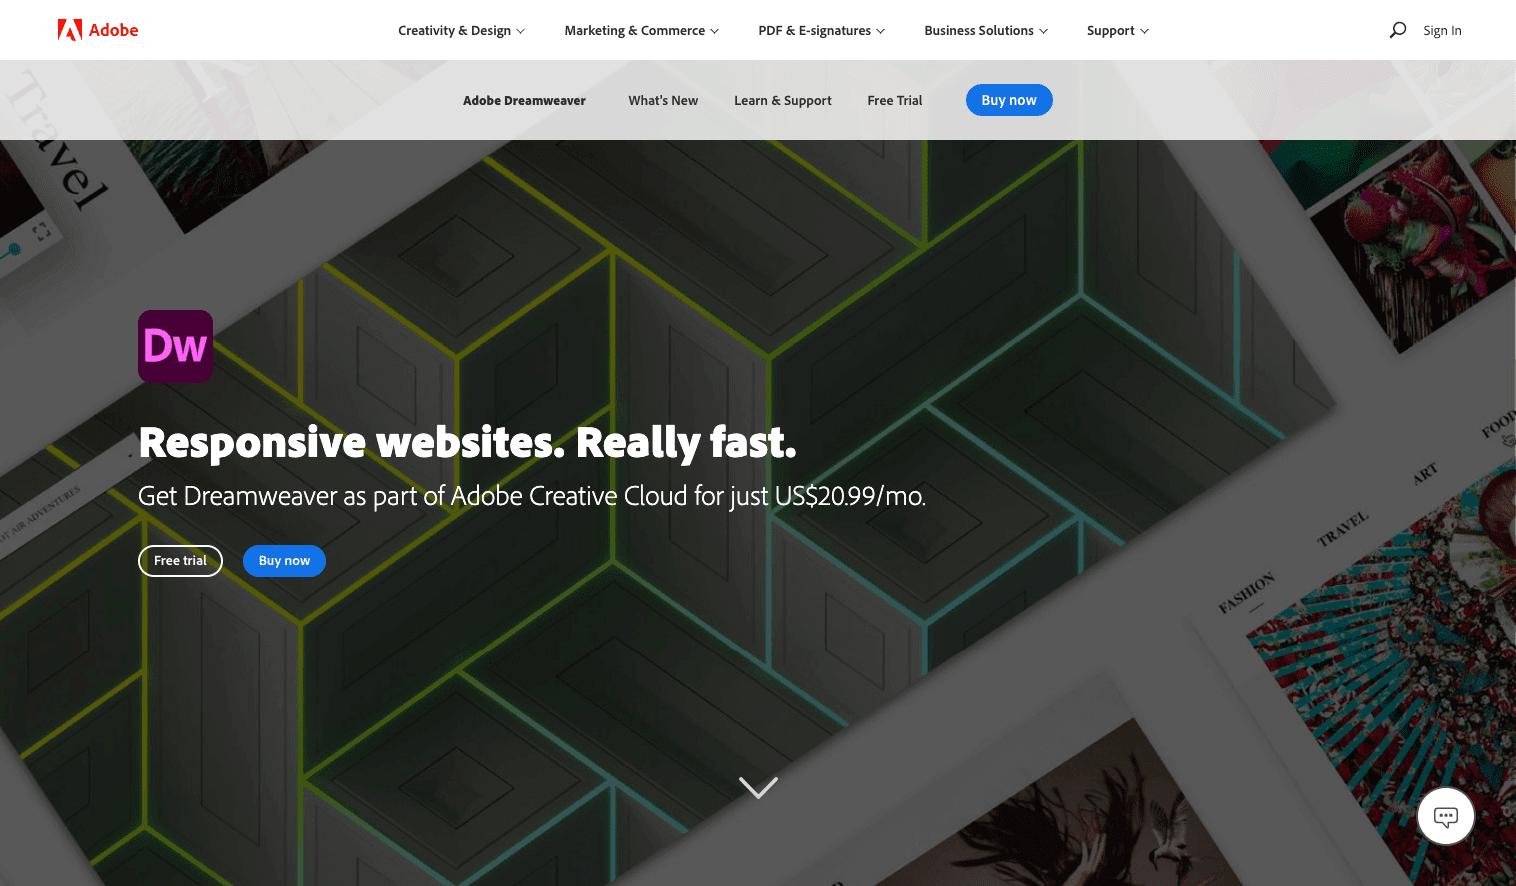 Screenshot of Adobe Dreamweaver homepage